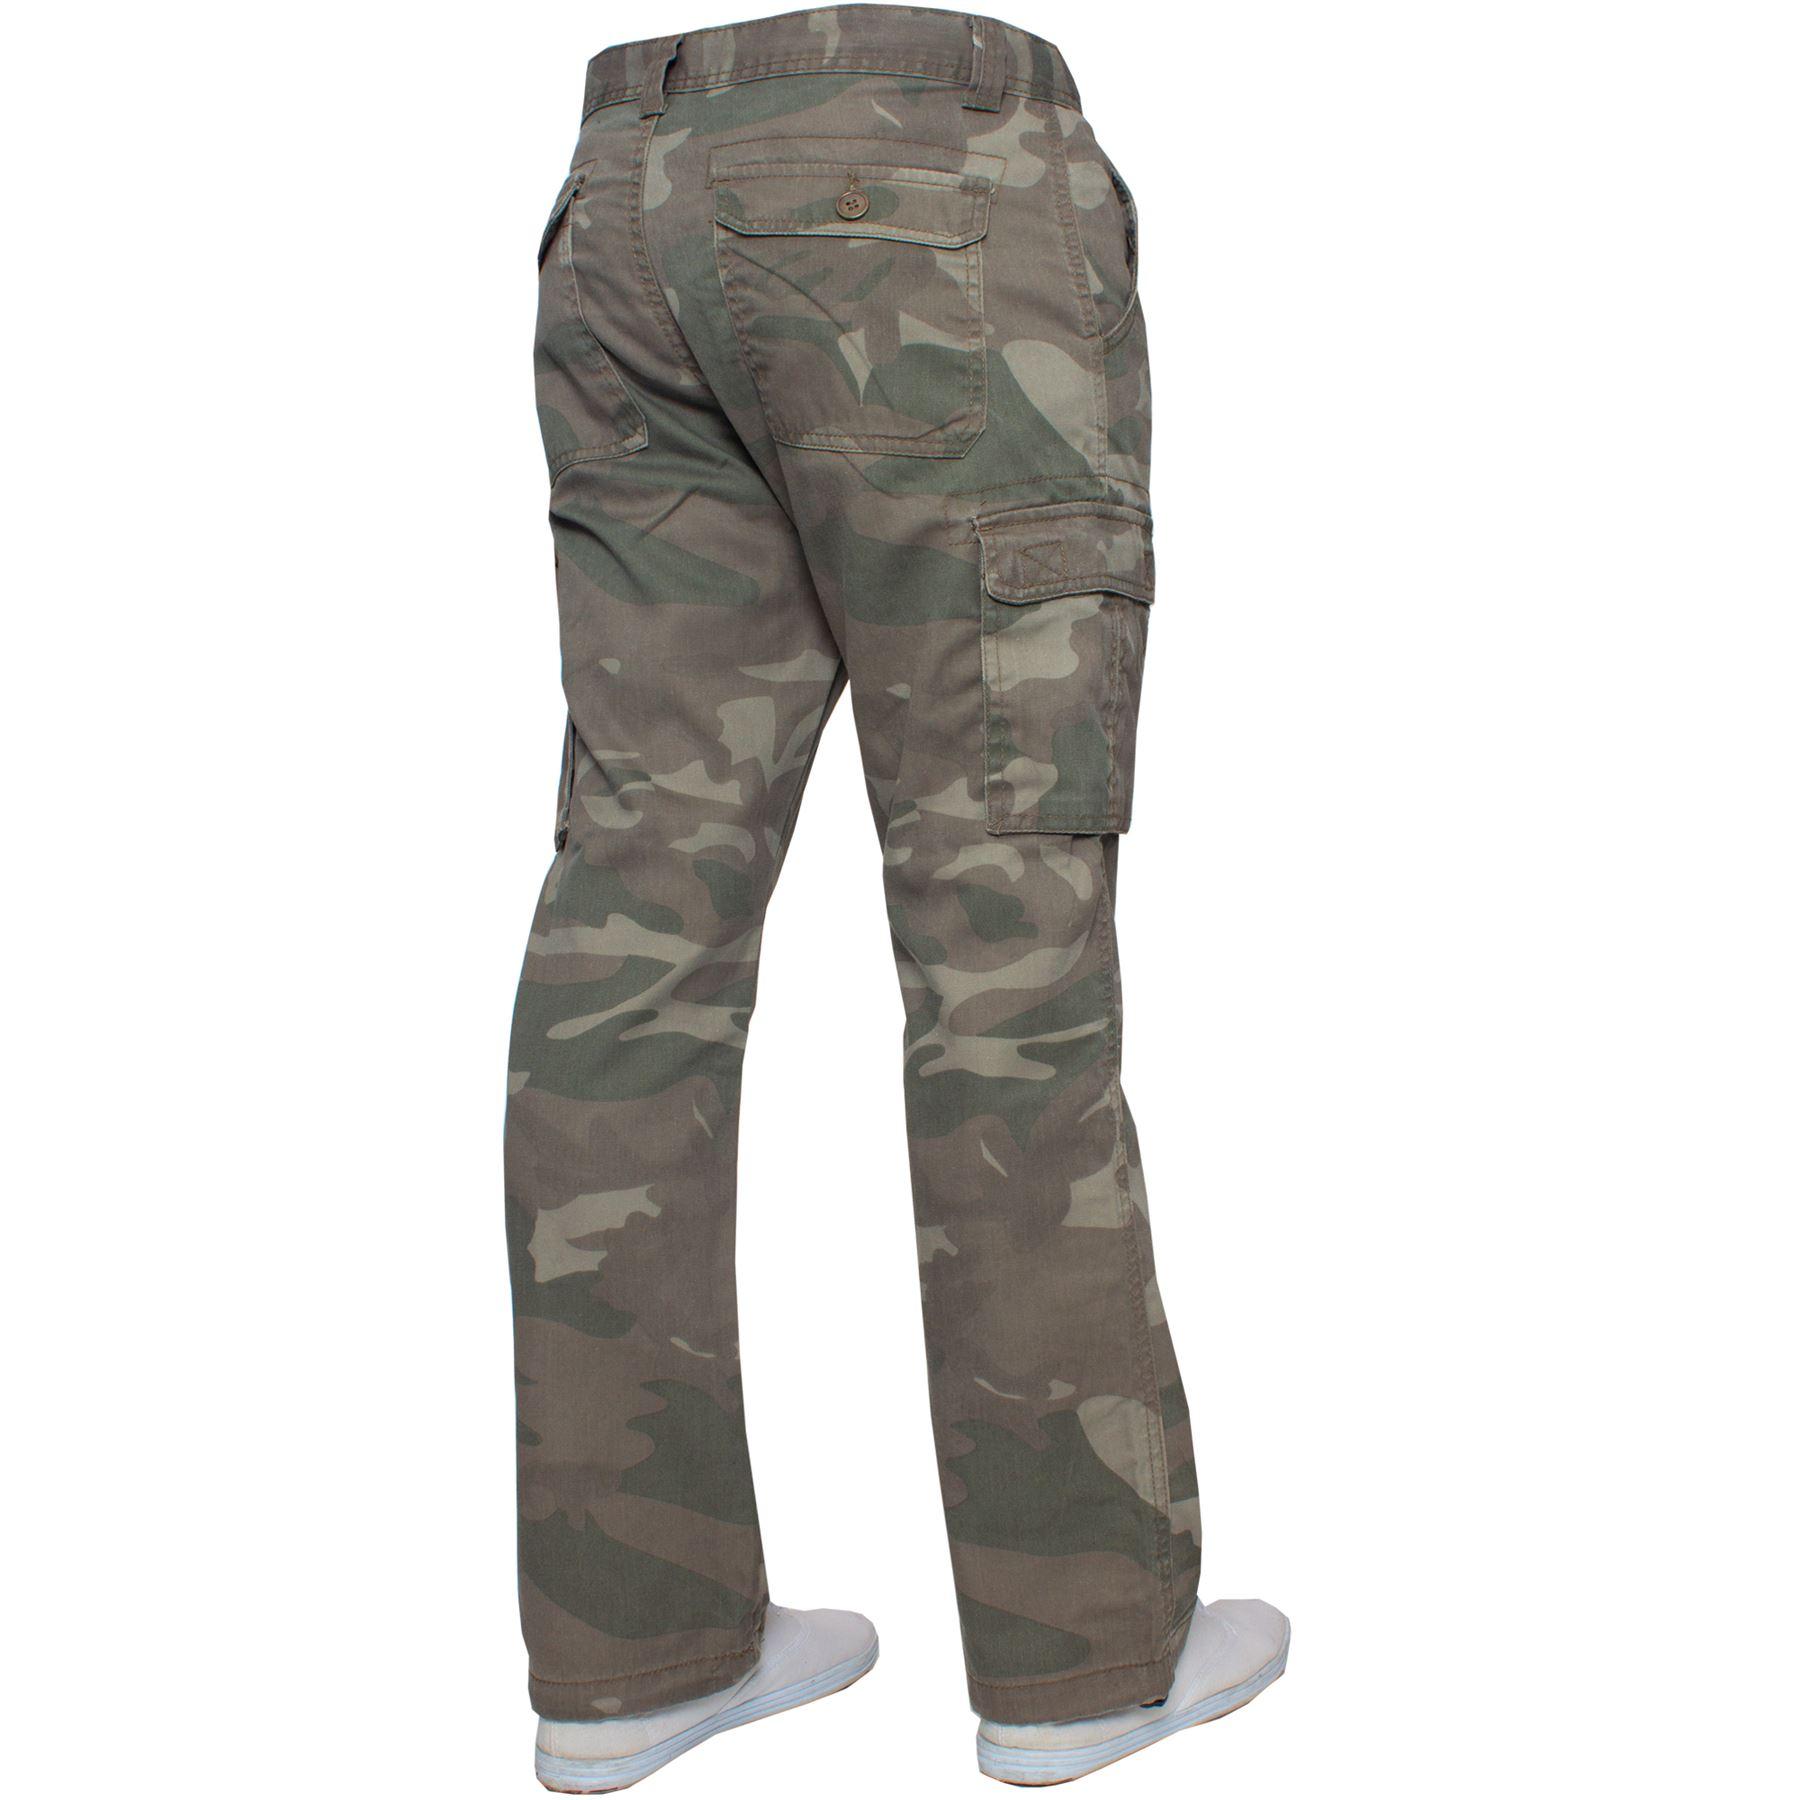 Hombre Kruze Combate Pantalones Militares Caqui Camuflaje Verano Todo Cintura Ebay